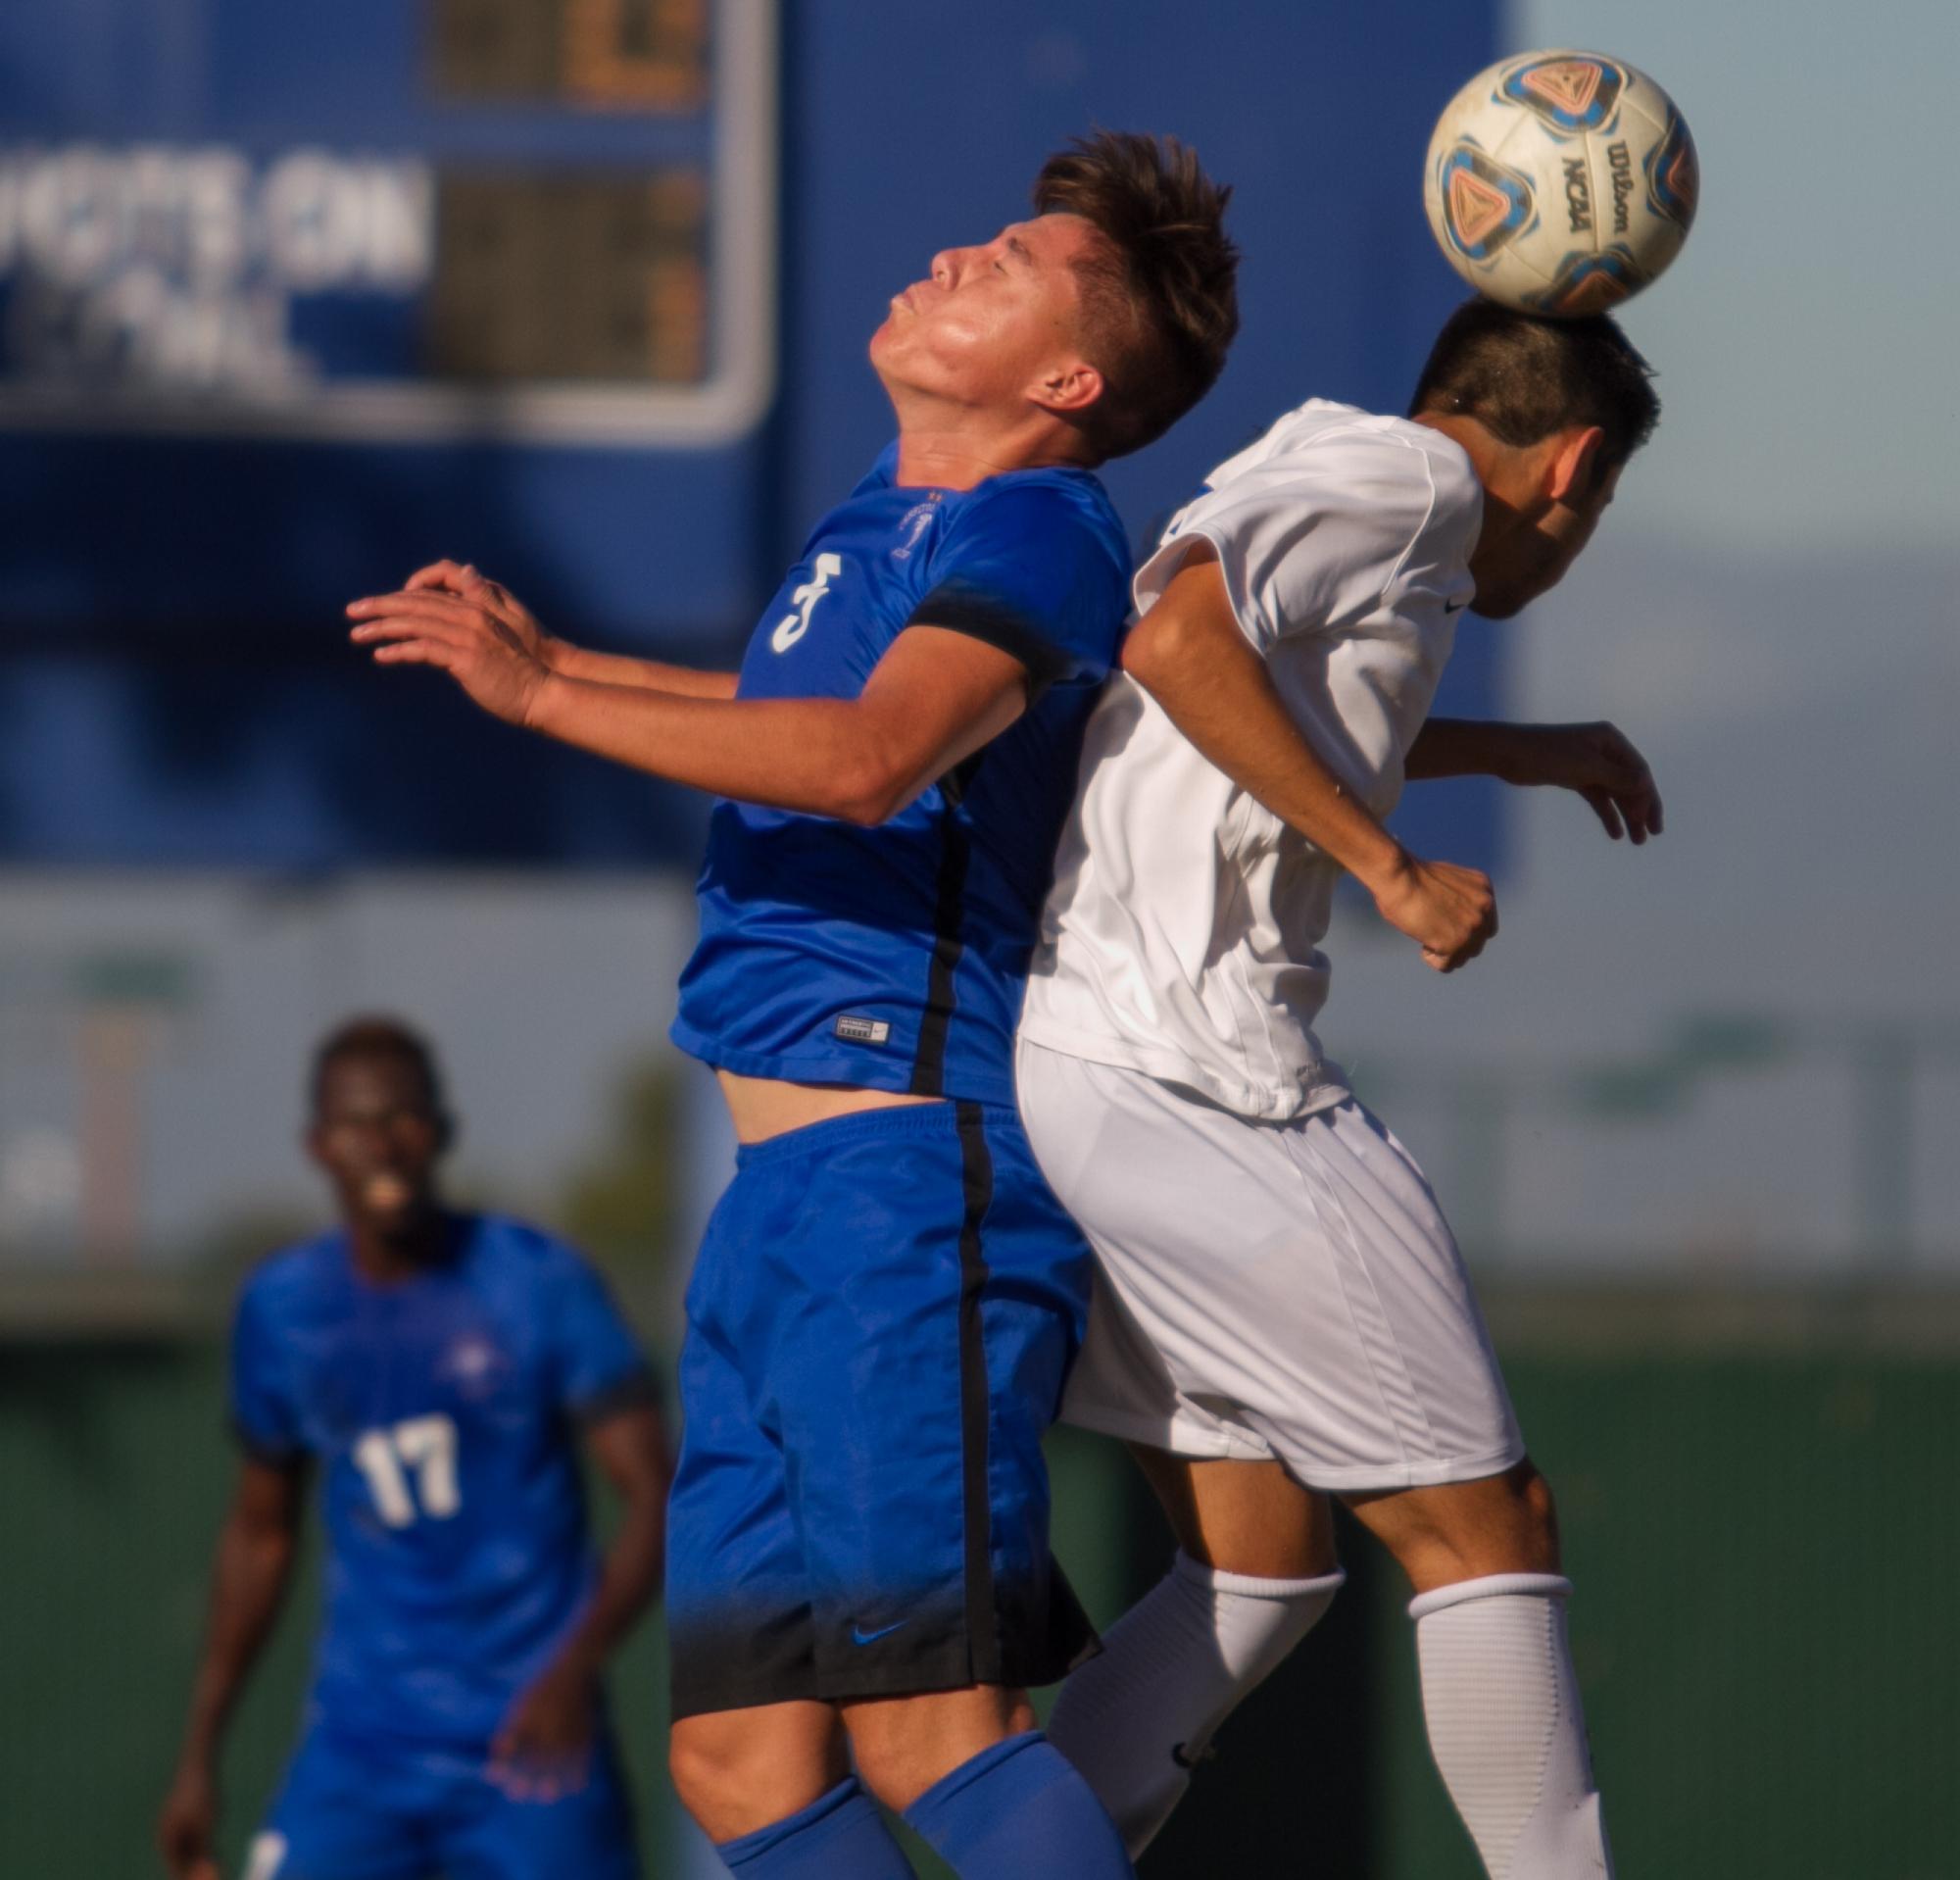 Santa Monica College Corsair Carlos Rincon (16)(R) contests a header against Cerritos College Falcon Luis Lira (5)(L) on Wednesday, November 22, 2017, at Cerritos College in Norwalk, California. The Corsairs lose 2-1. (Josue Martinez)